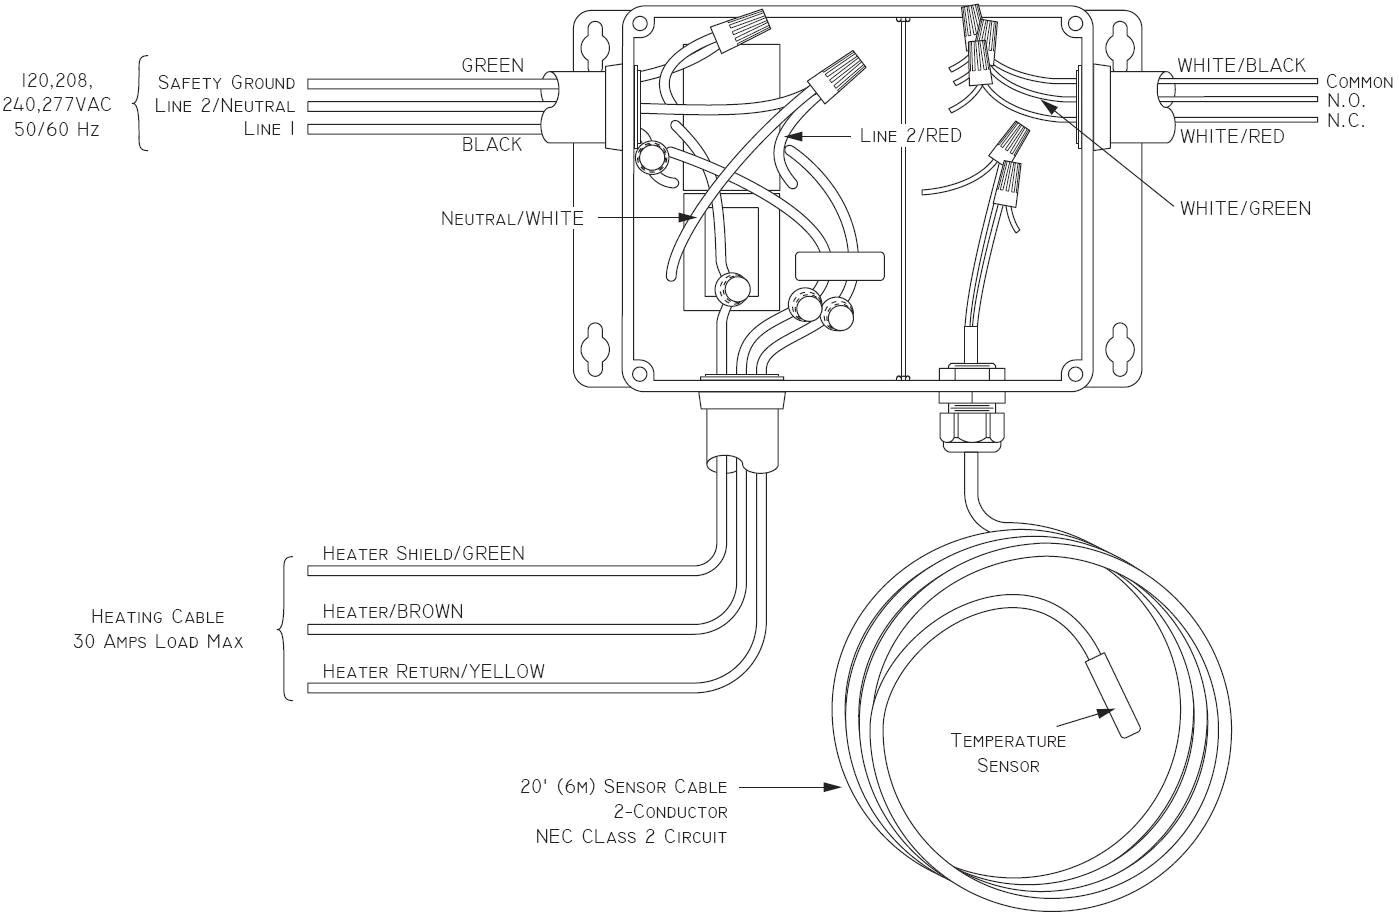 lanair waste oil heater wiring diagram